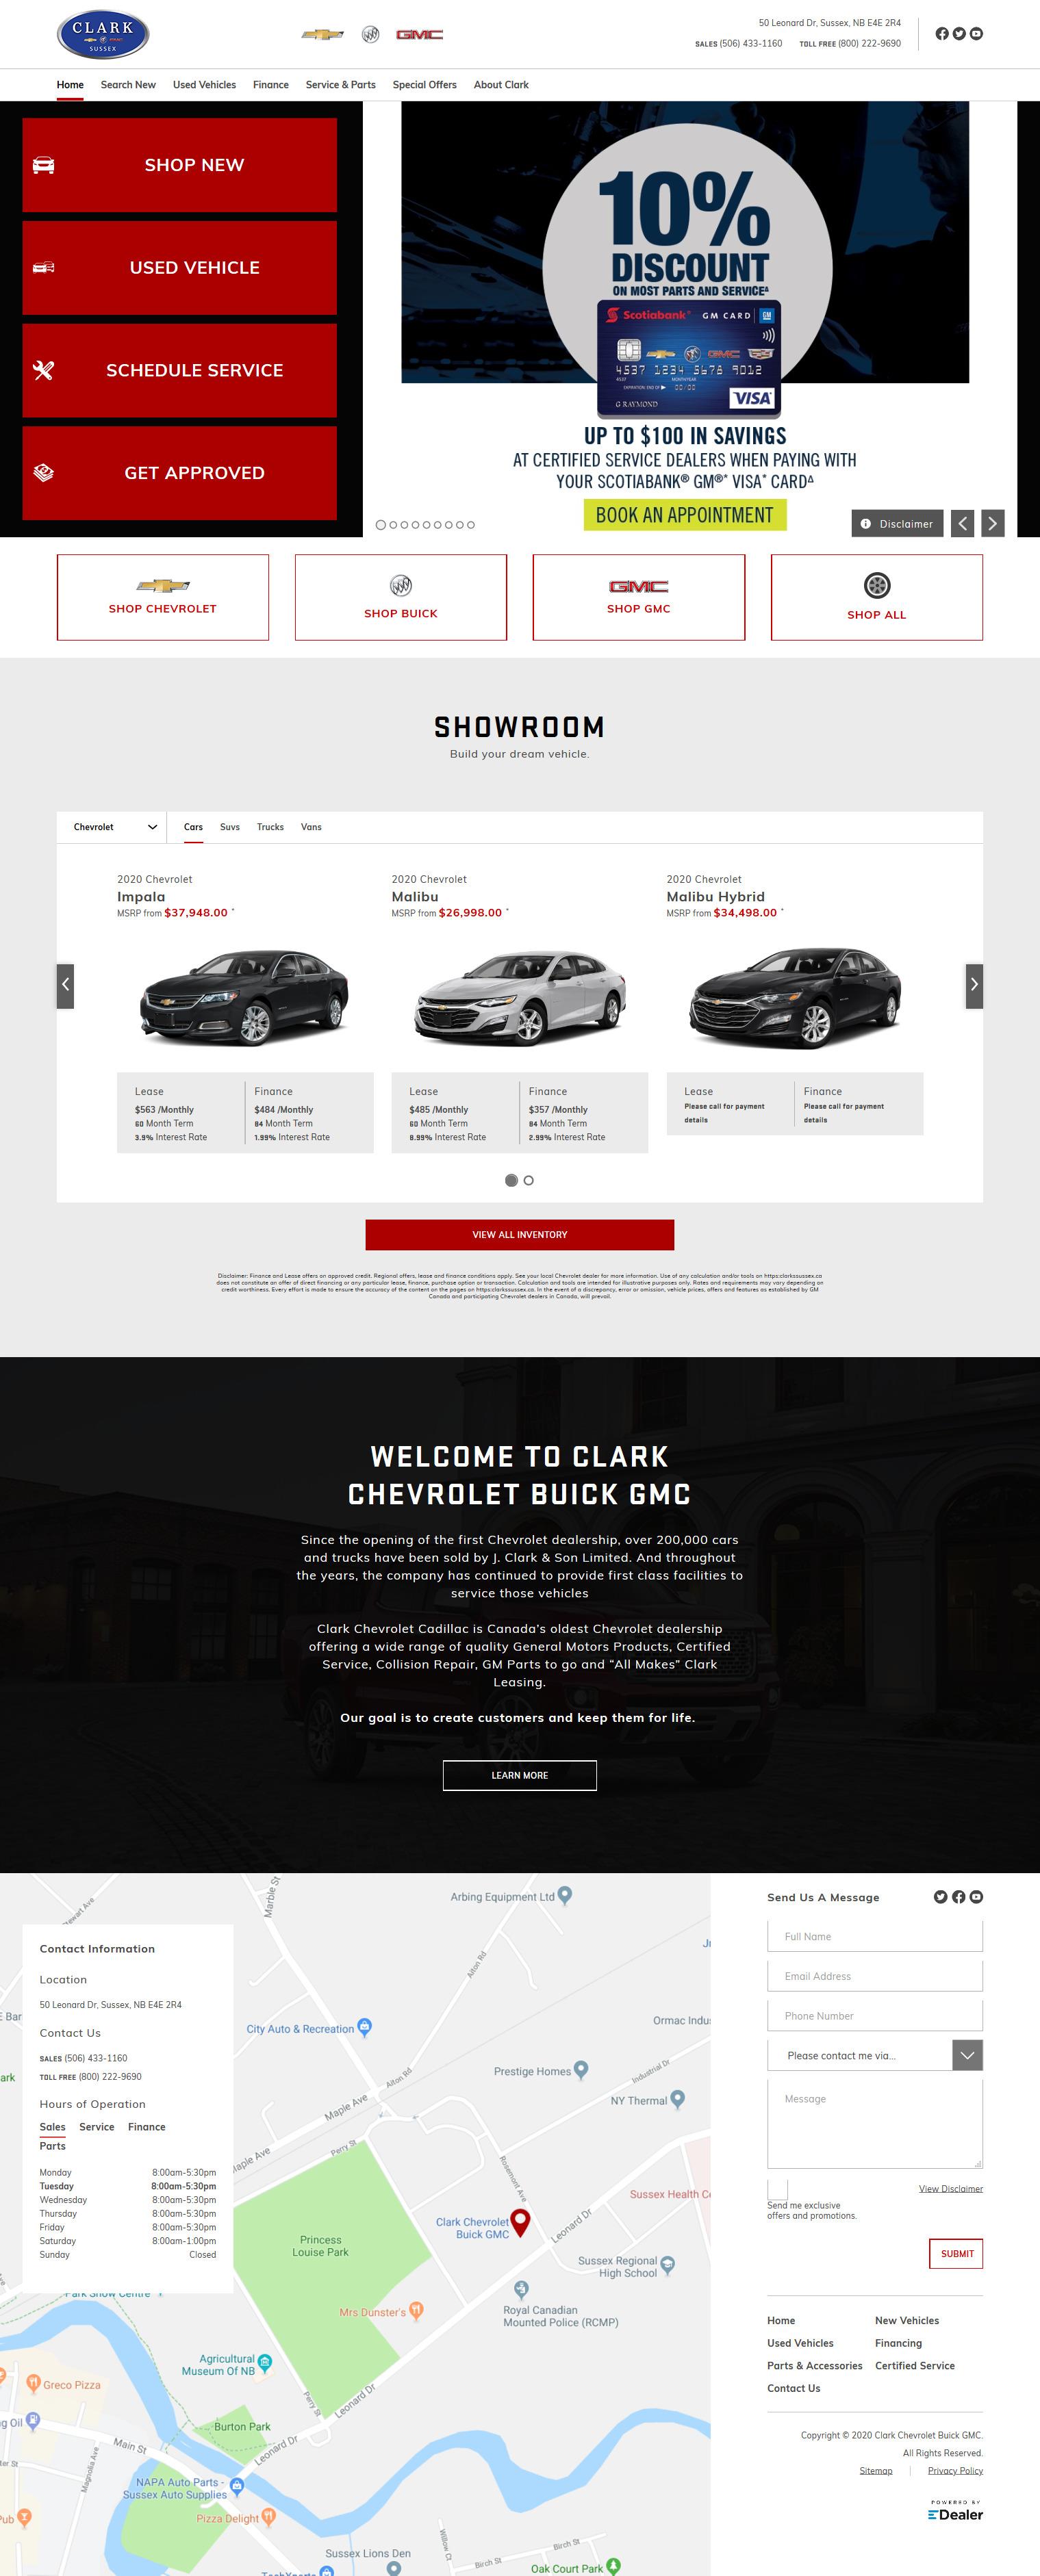 Clark Chevrolet Buick GMC